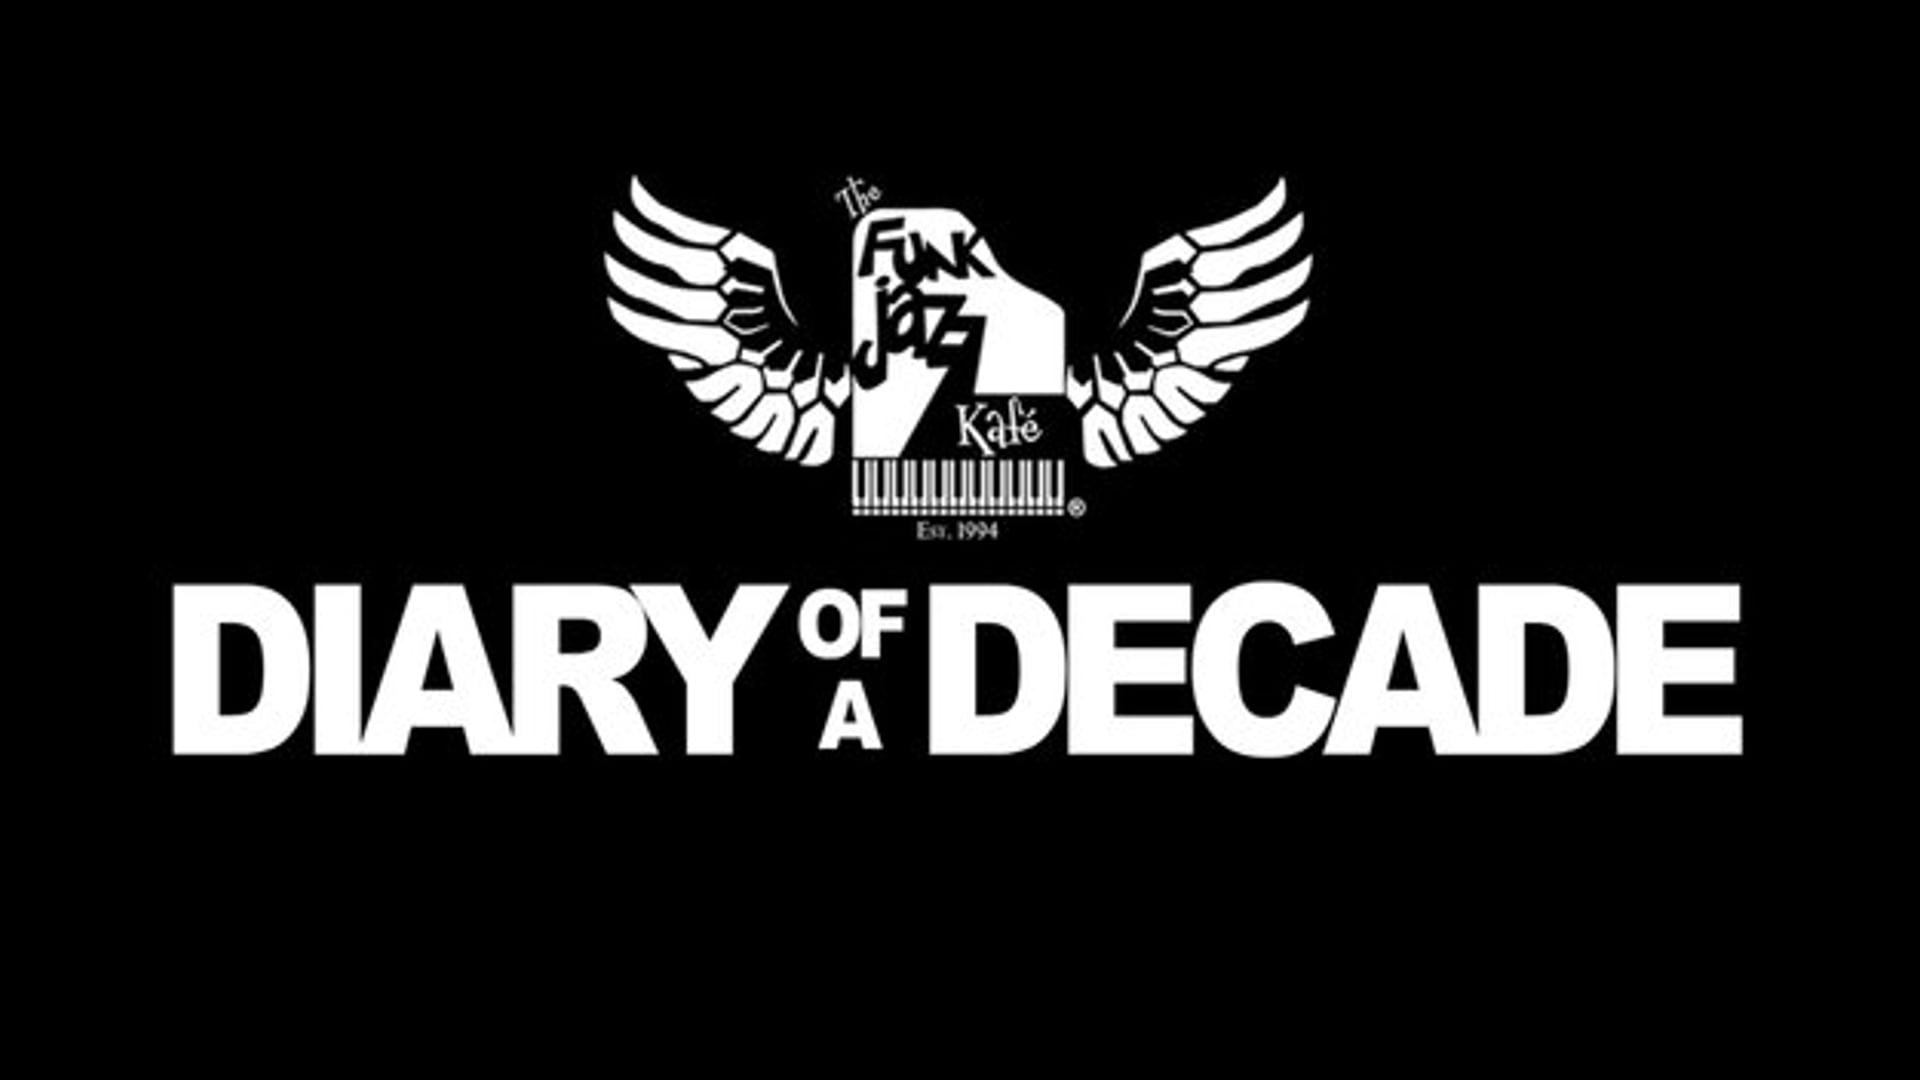 """FunkJazz Kafé: DIARY OF A DECADE"" [Extended Movie Trailer]"